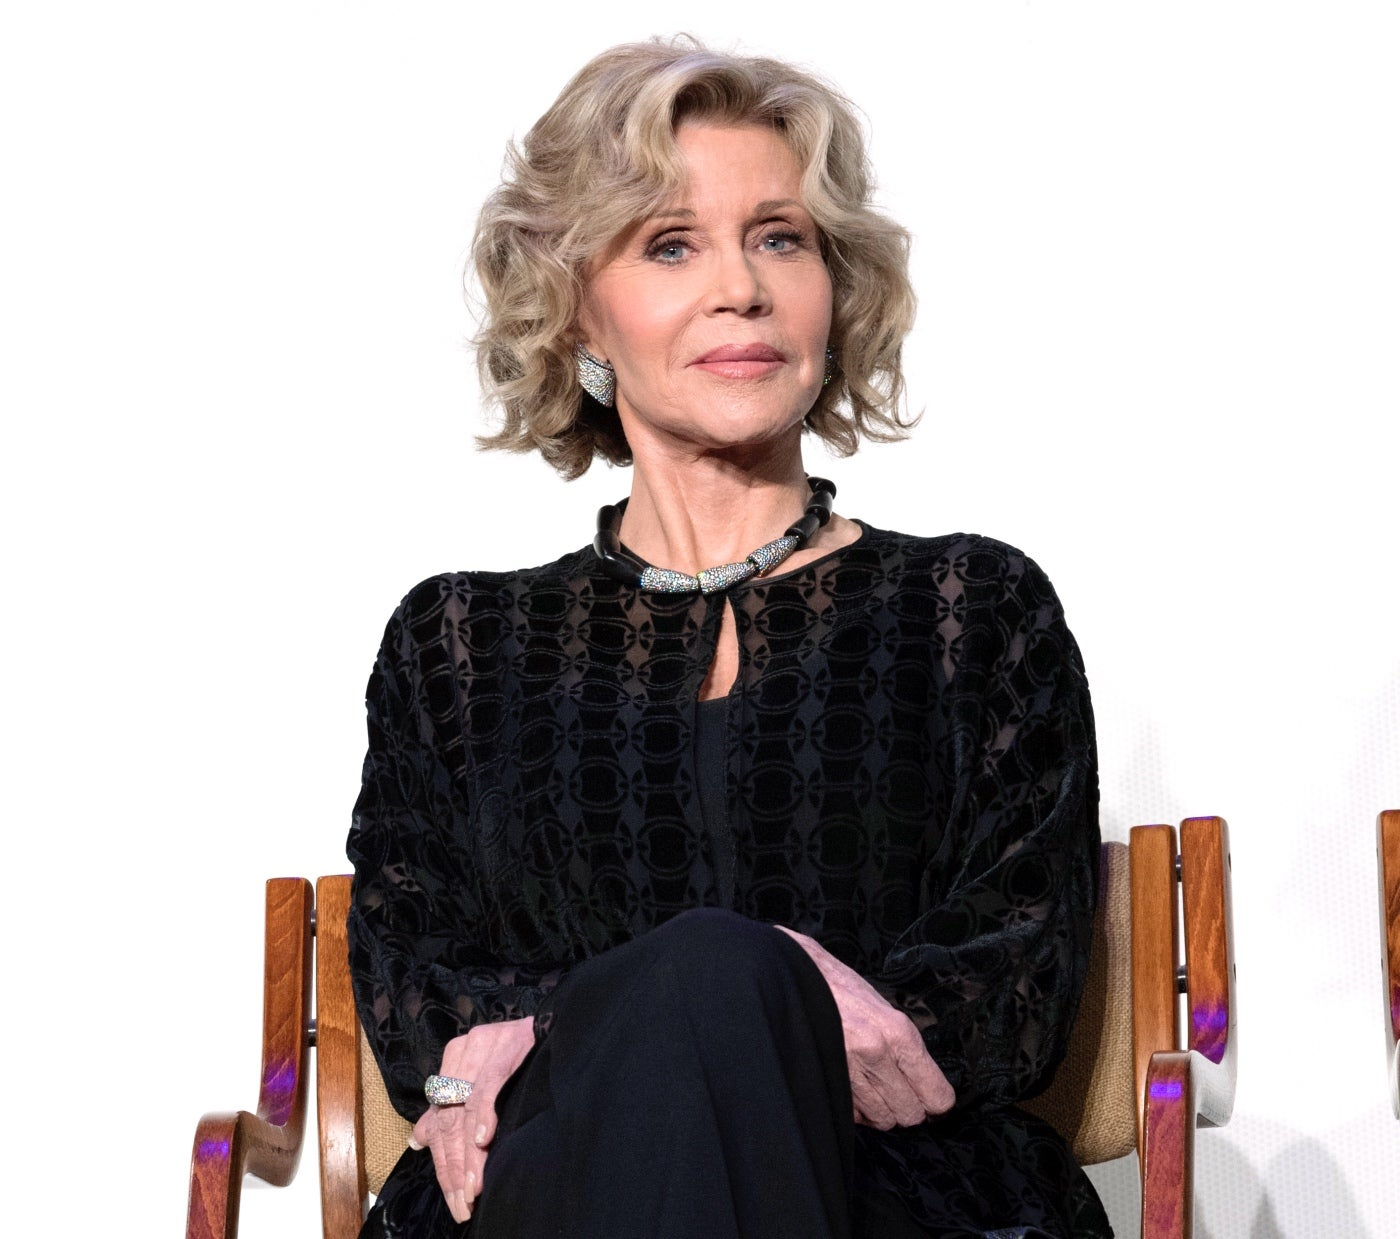 Jane Fonda at the Restoration Summit 2019